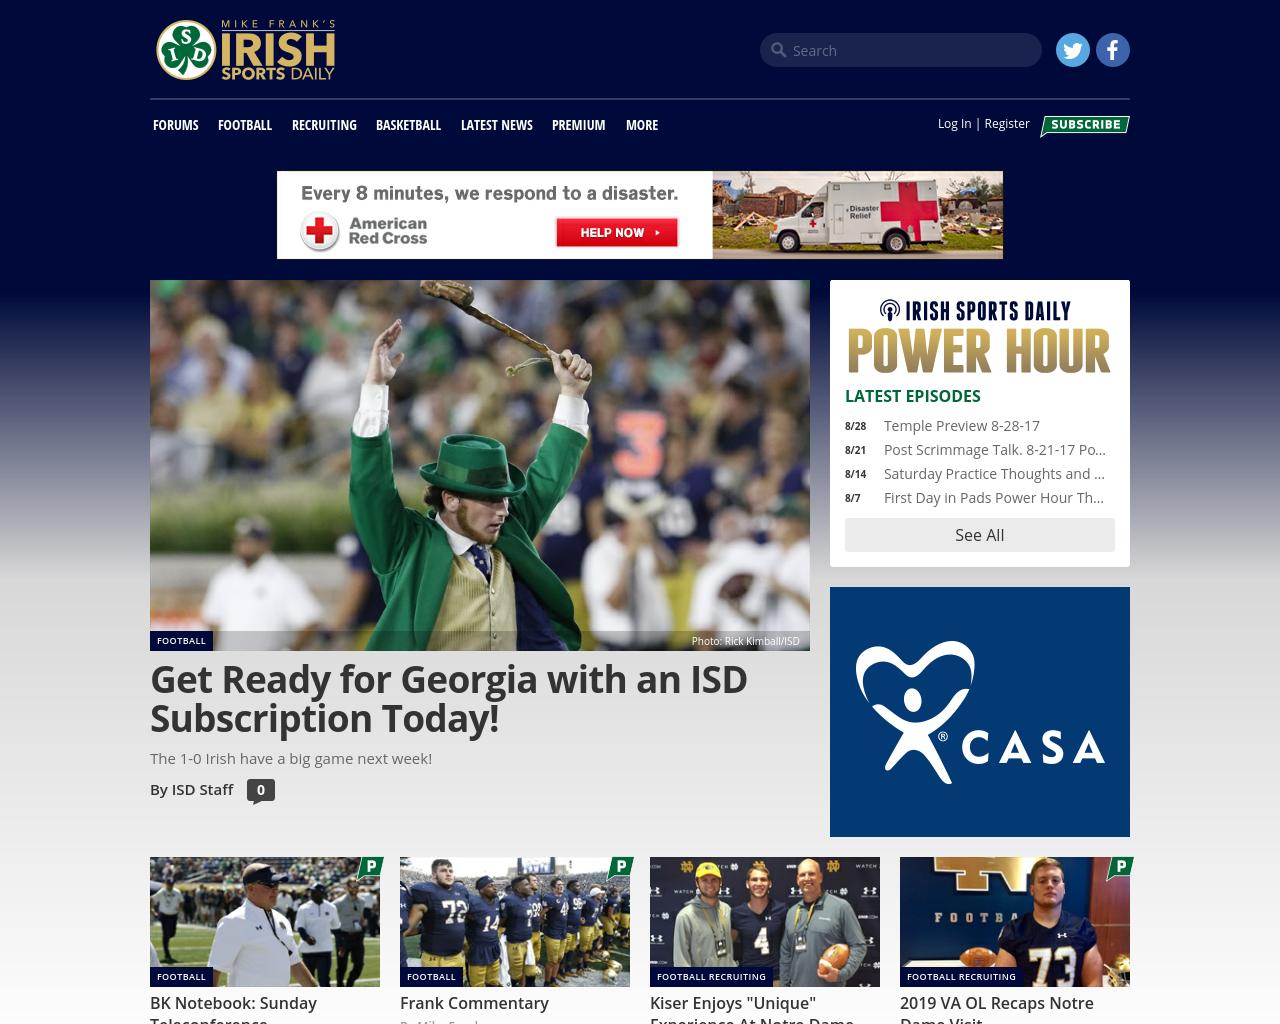 irish-sports-daily-Advertising-Reviews-Pricing